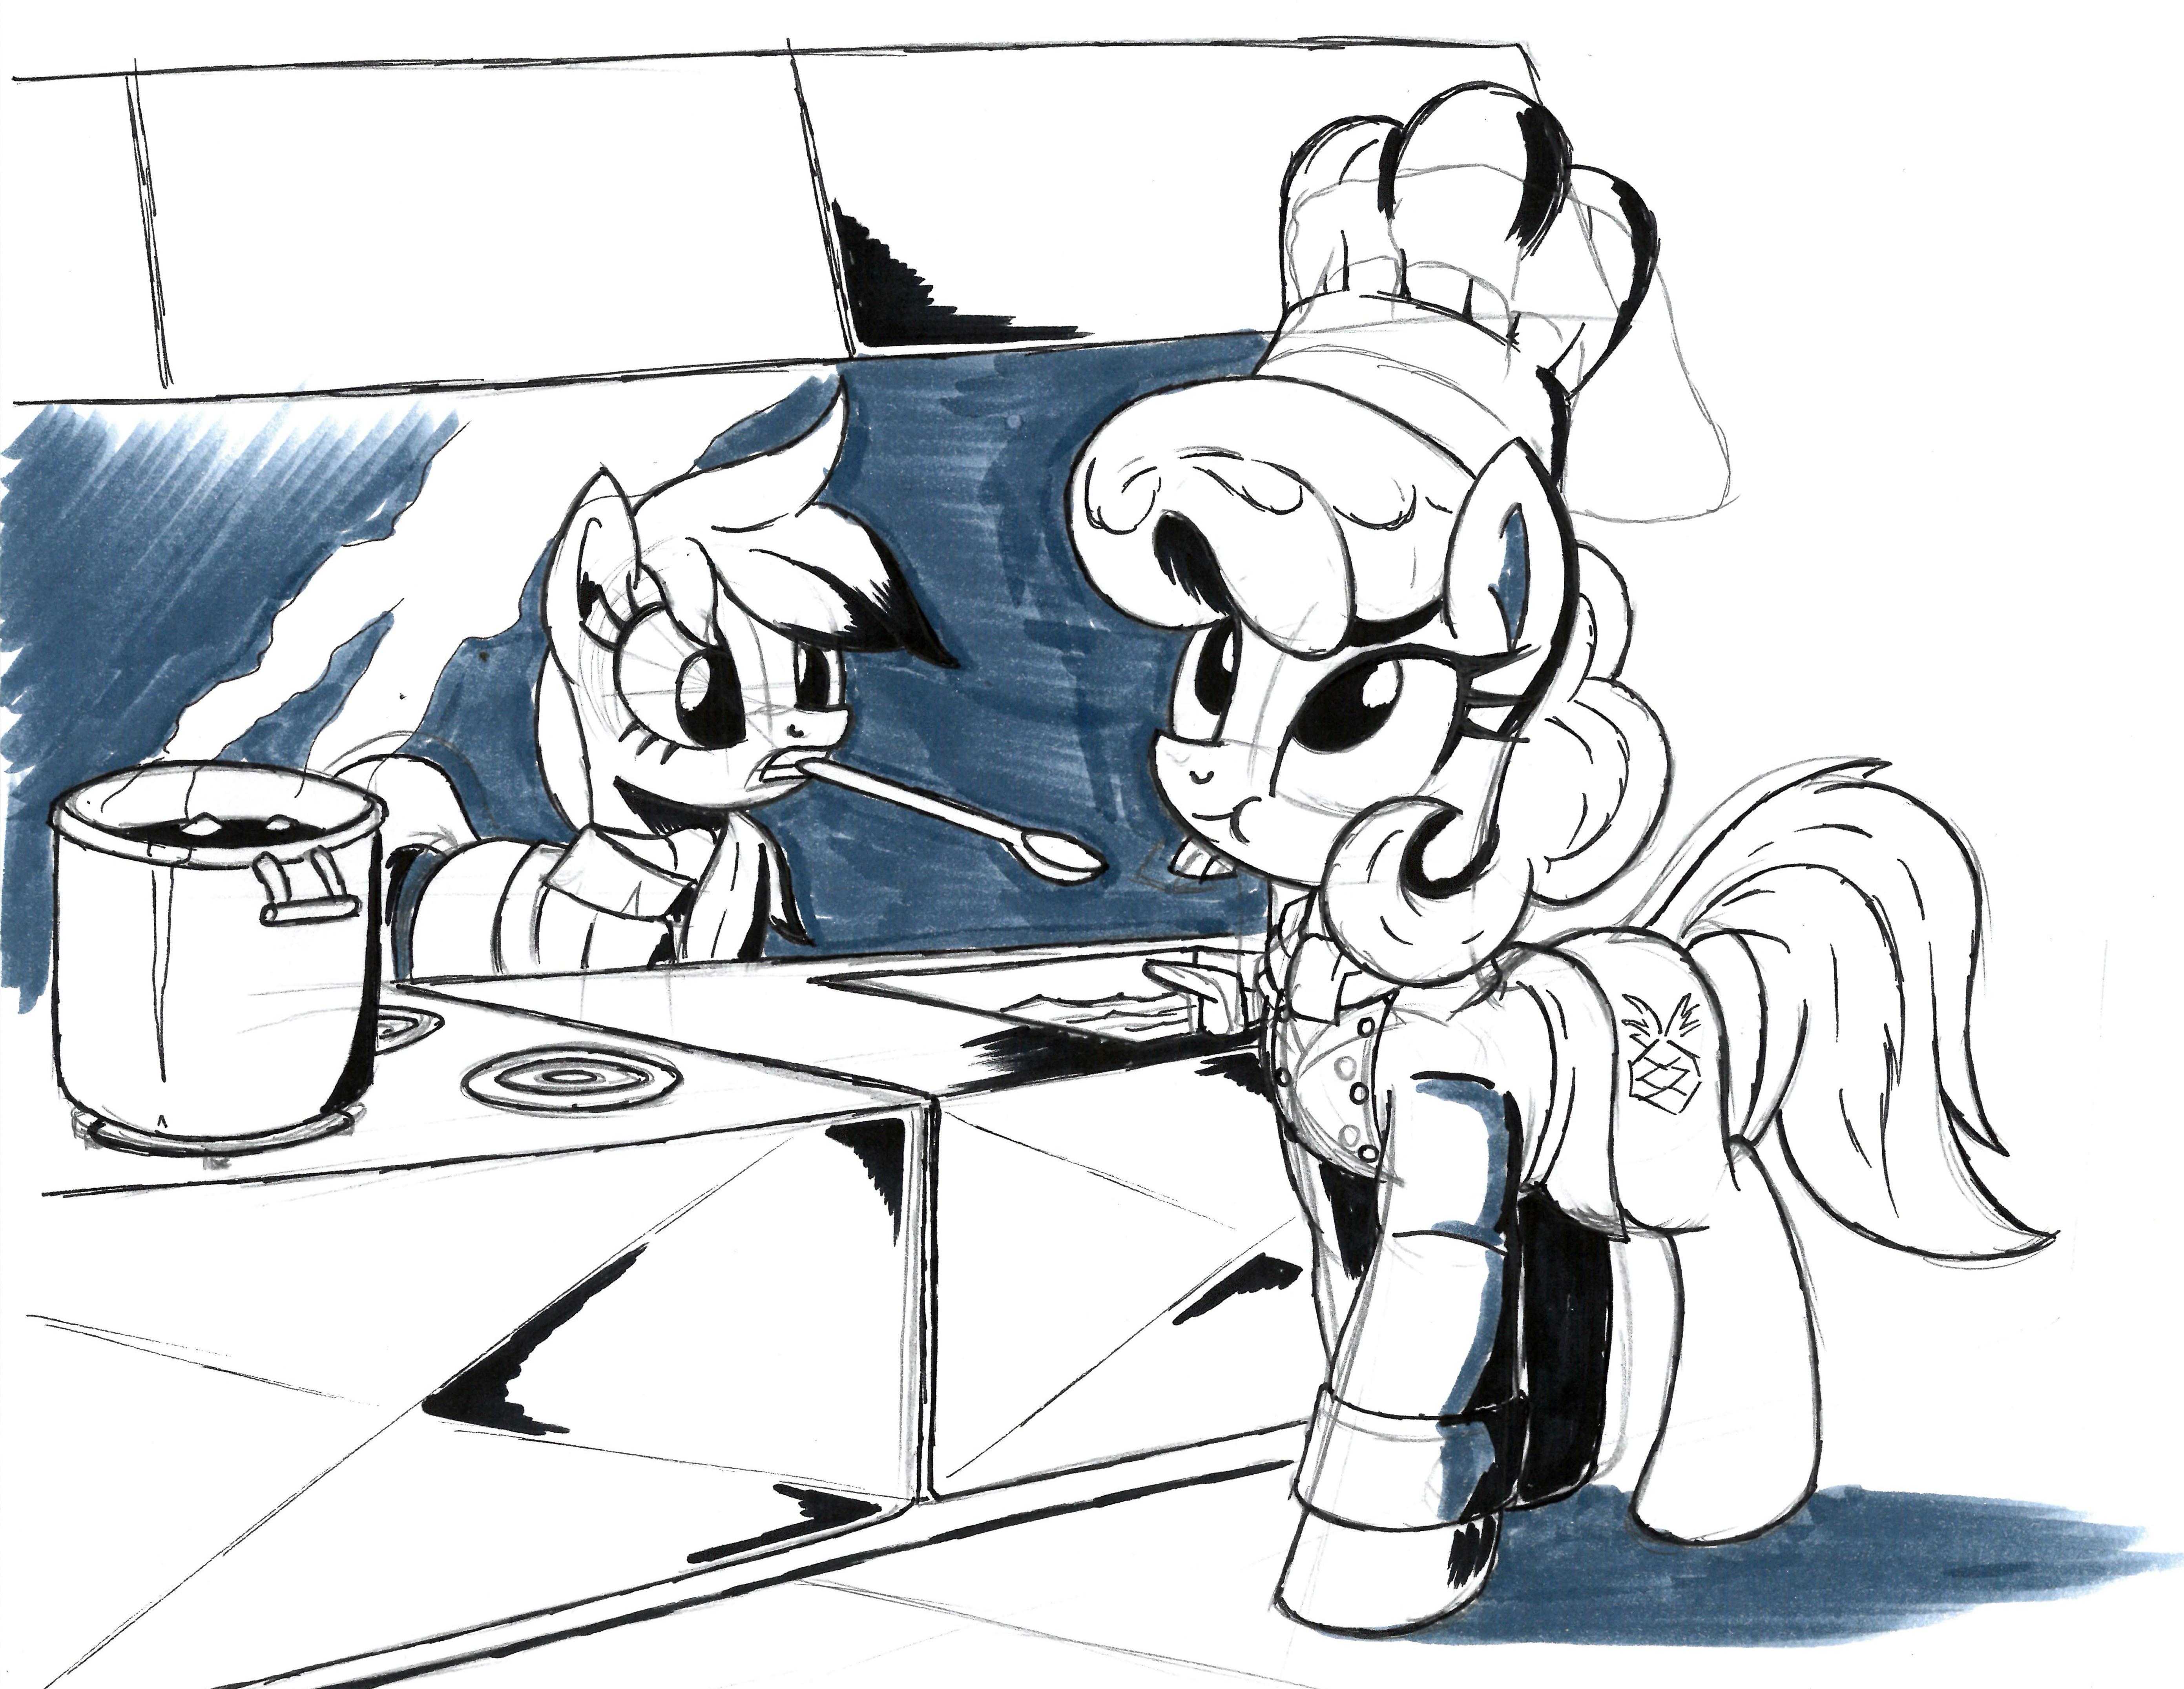 Commission doodle for MokaDog